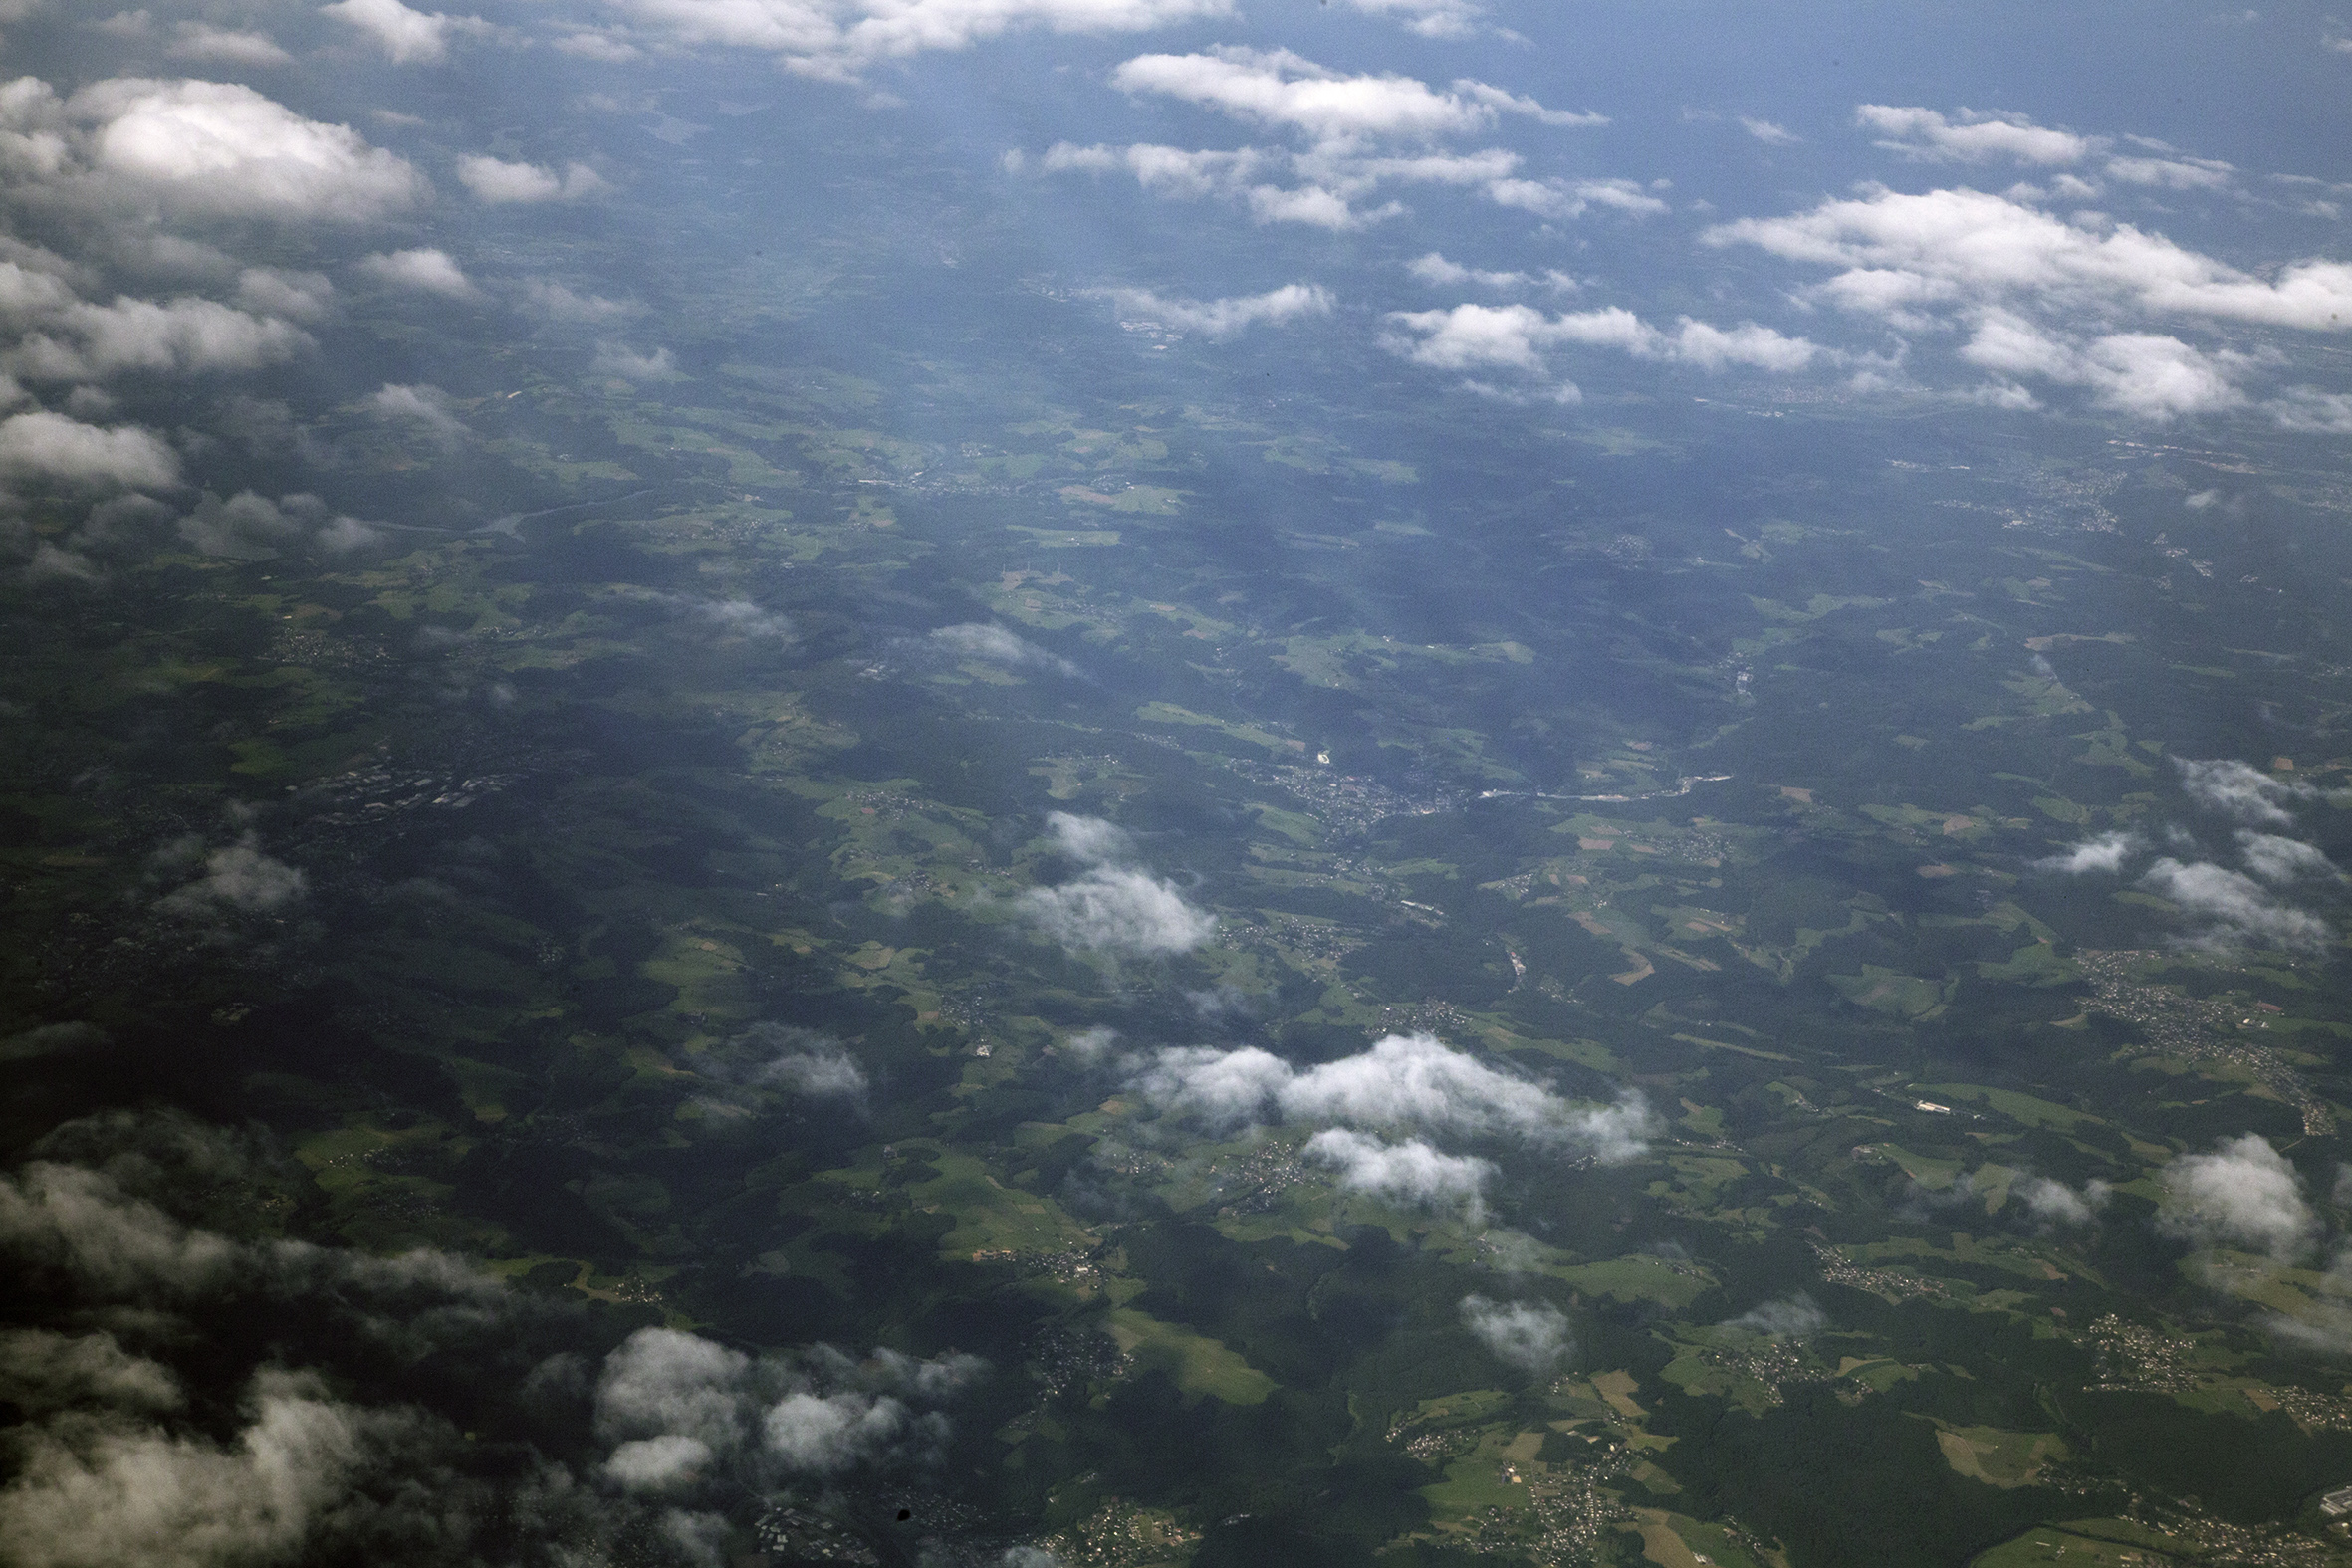 voyage-ecosse-paysages-2013-marie-colette-becker-01